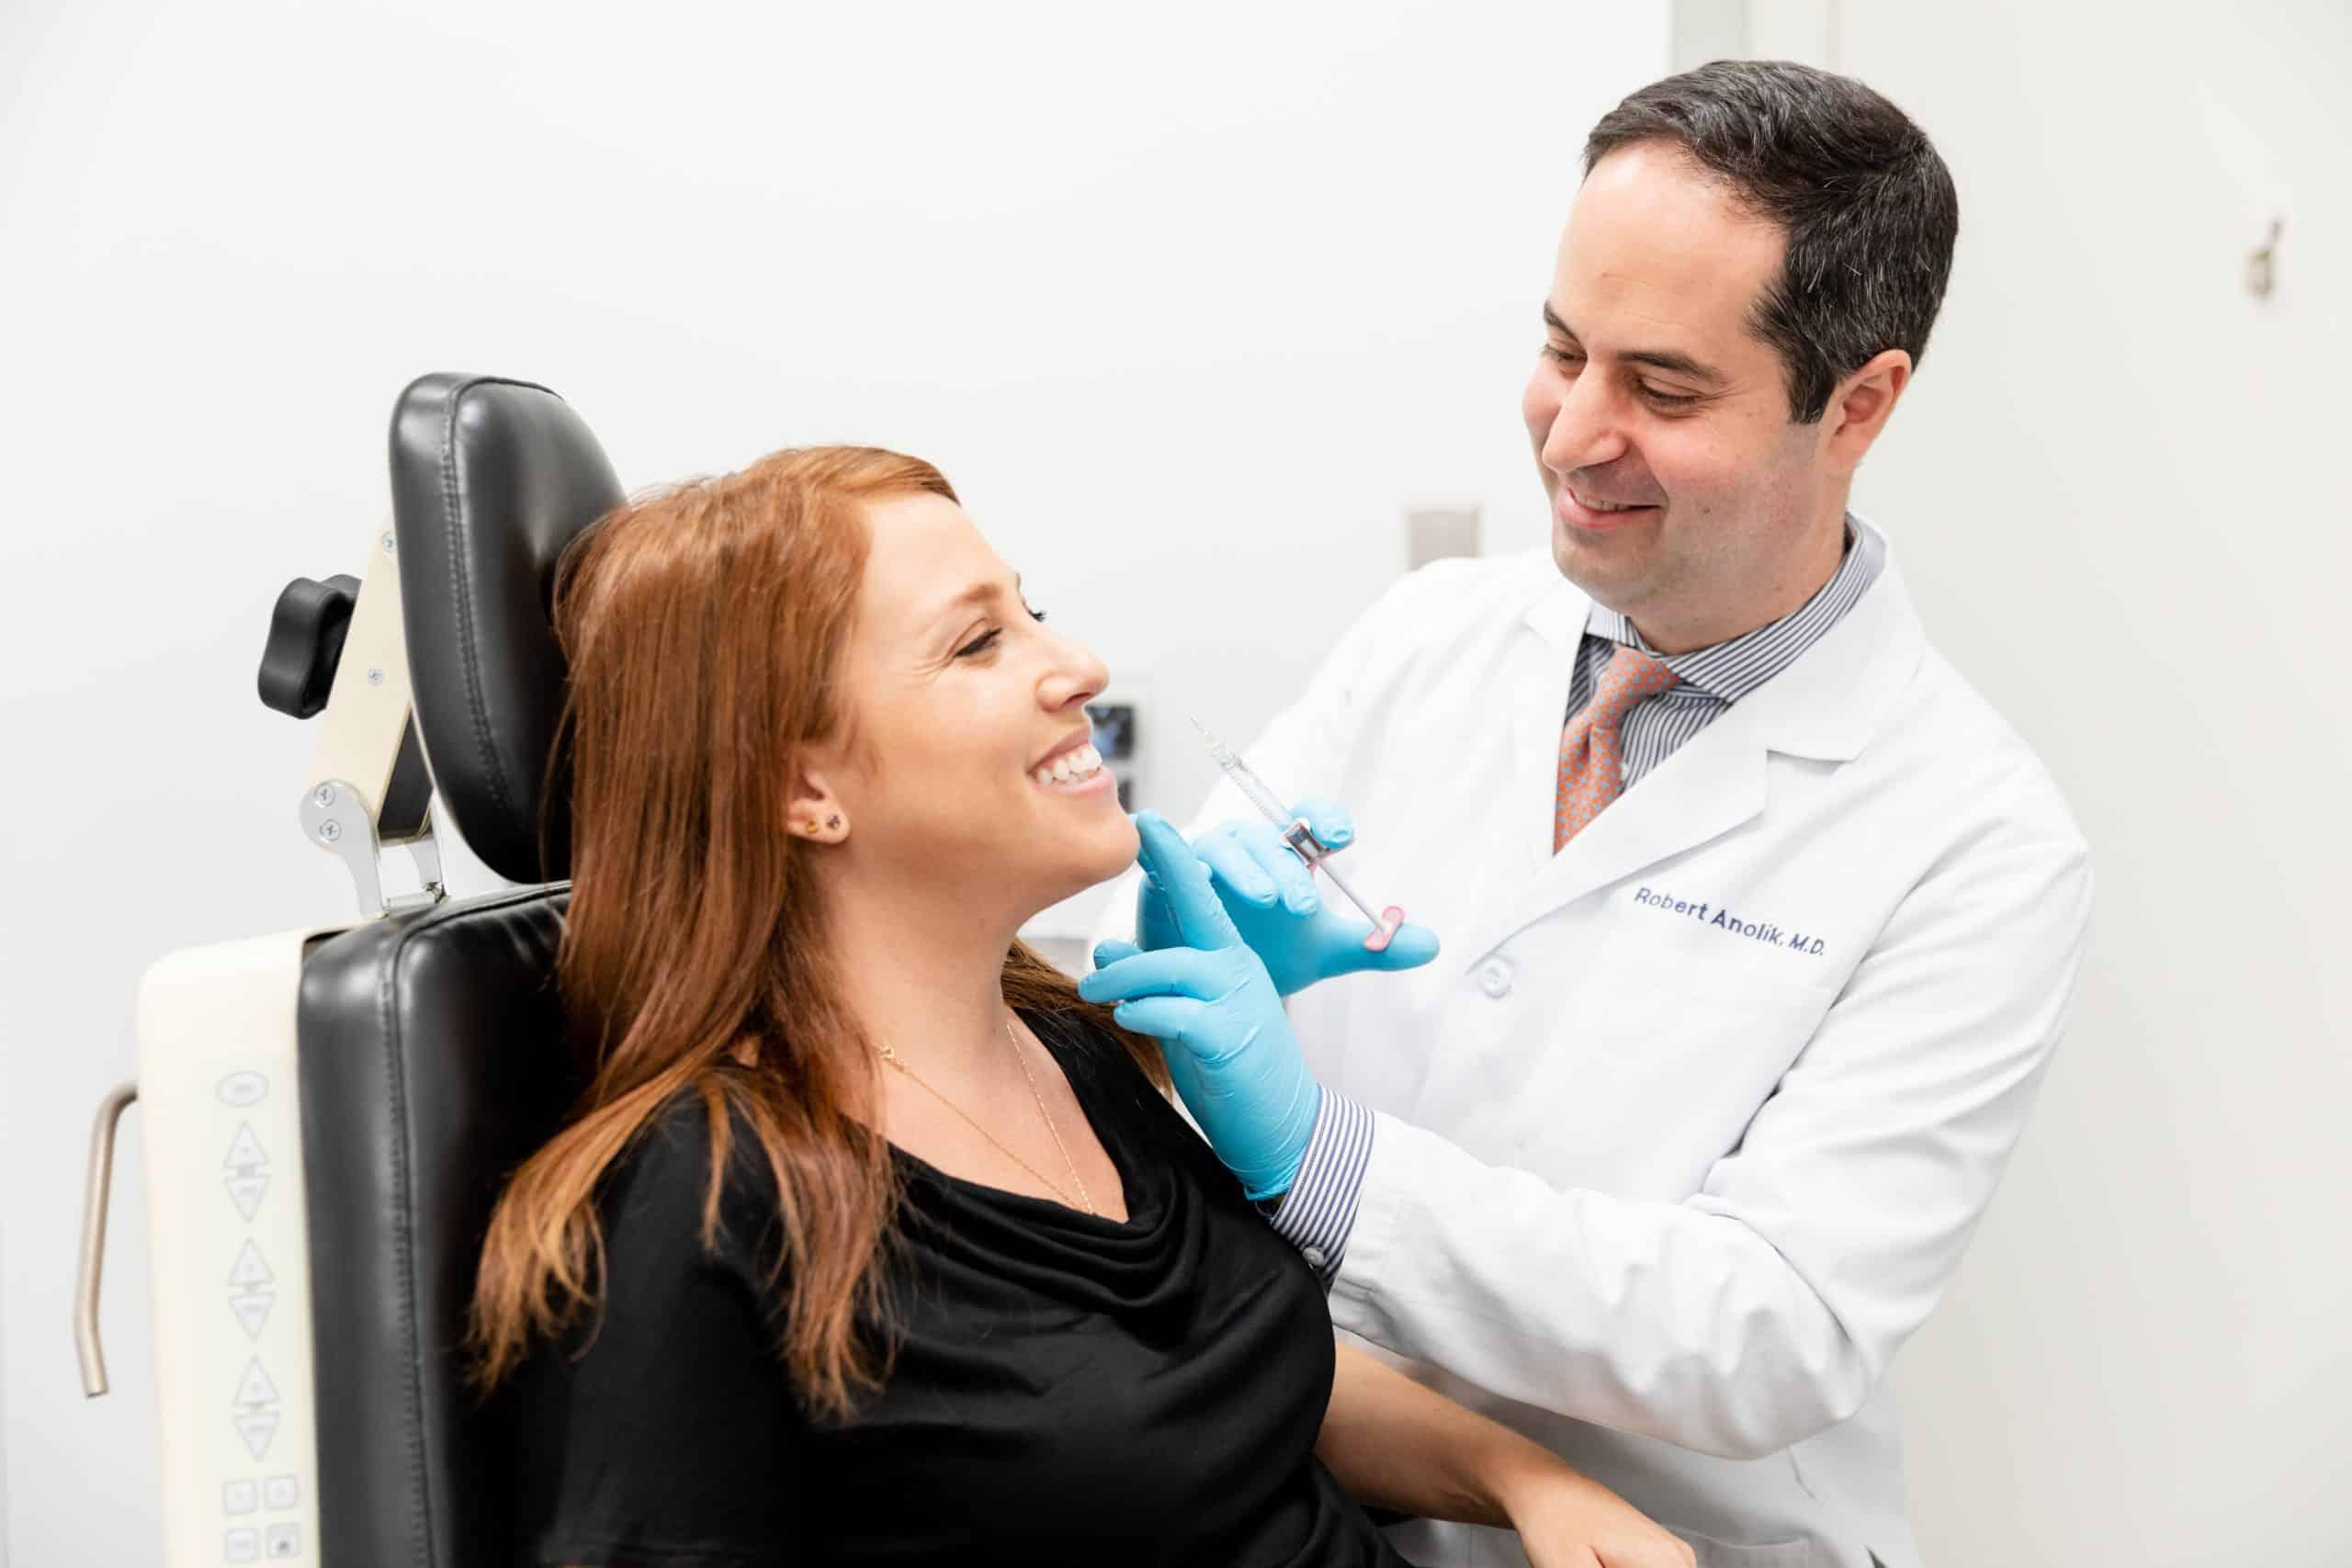 dermal filler injection in new york